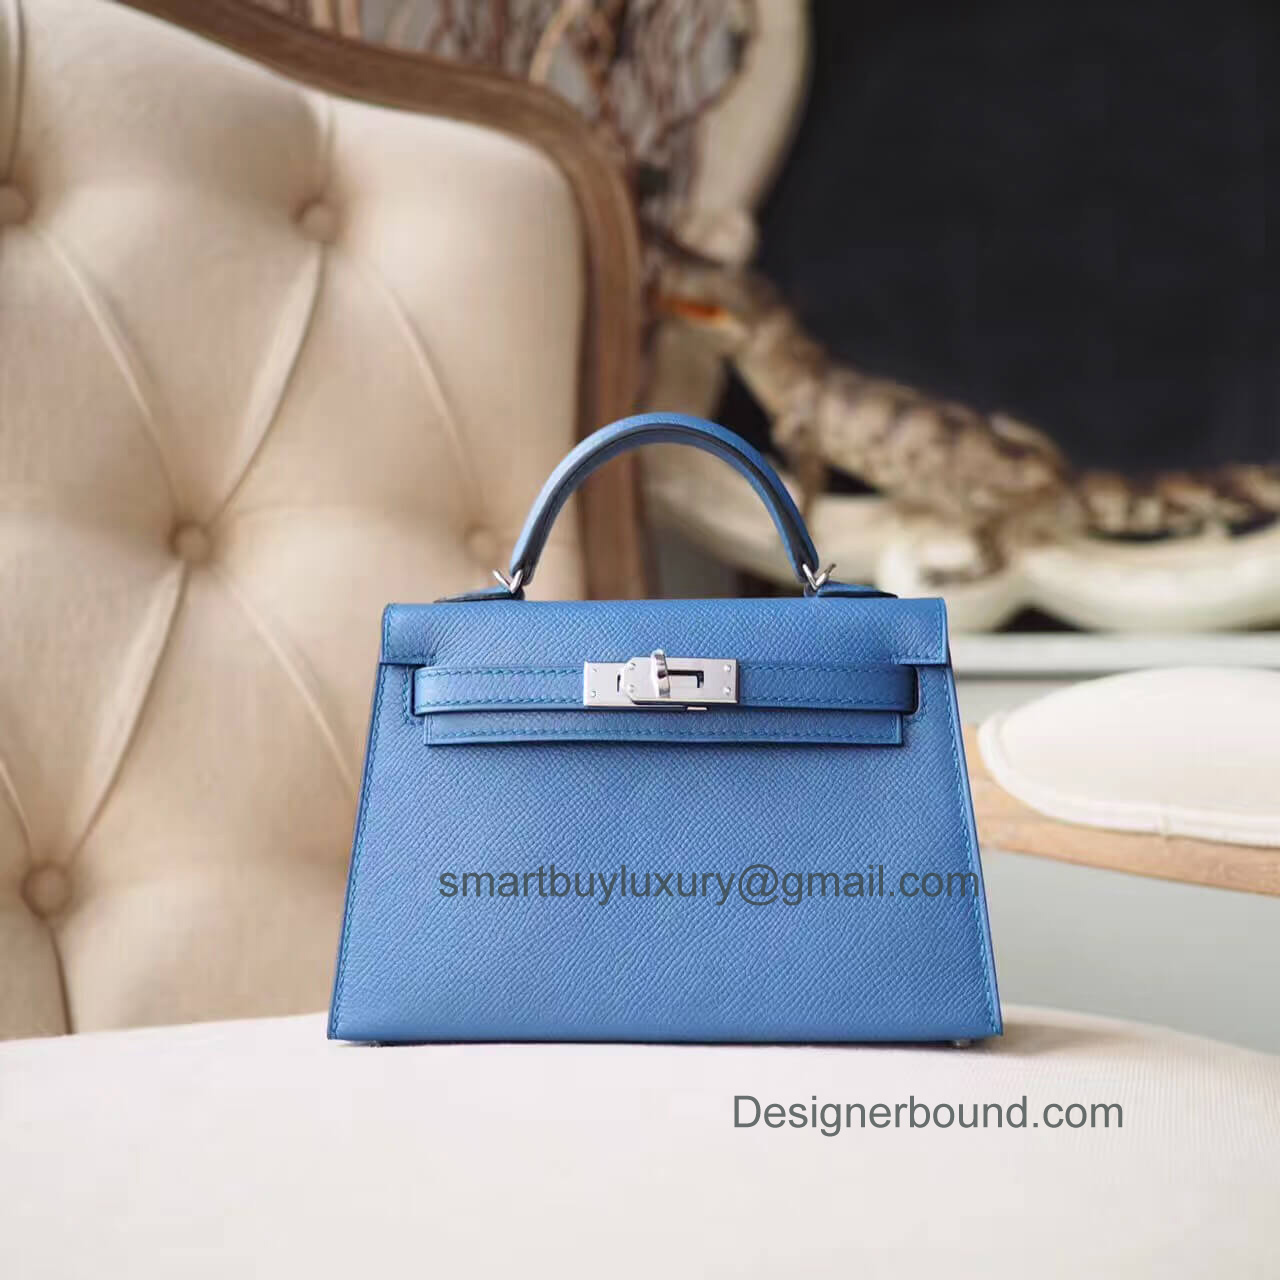 b953c7b8497 Hermes Mini Kelly II Bag in r2 Blue Agate Epsom PHW - Hermes Replica